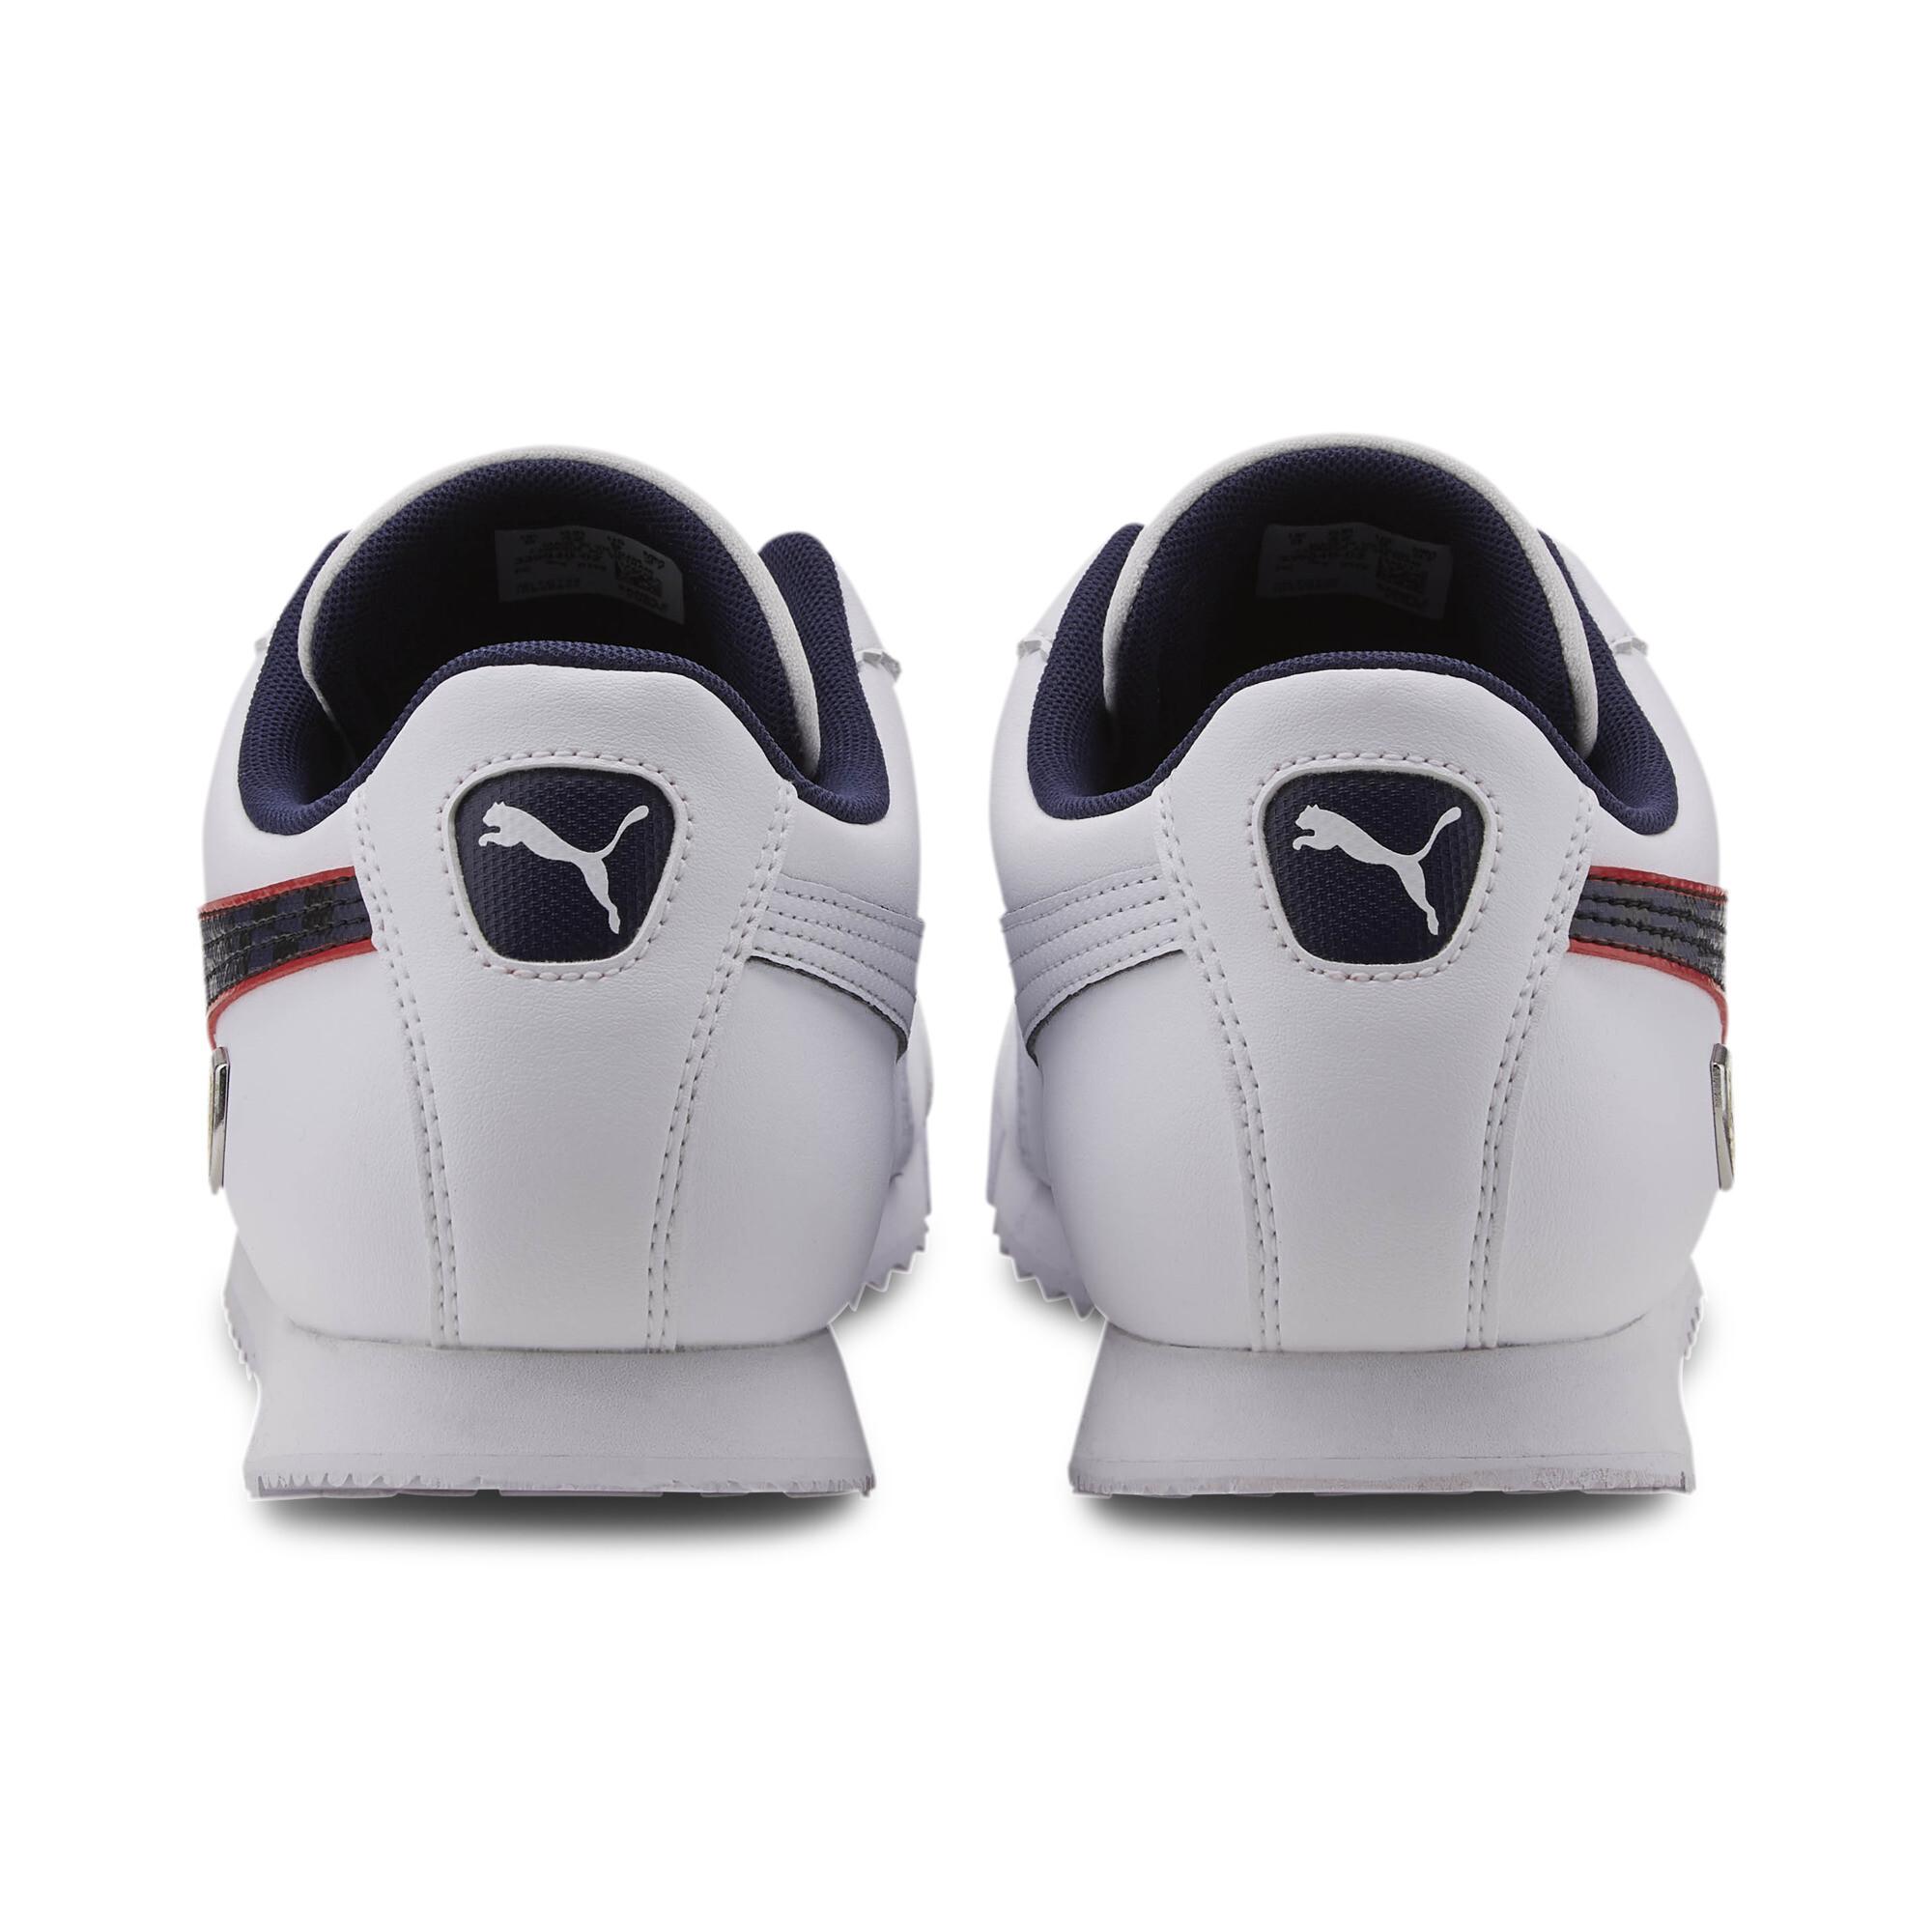 PUMA-Men-039-s-Scuderia-Ferrari-Roma-Sneakers thumbnail 10